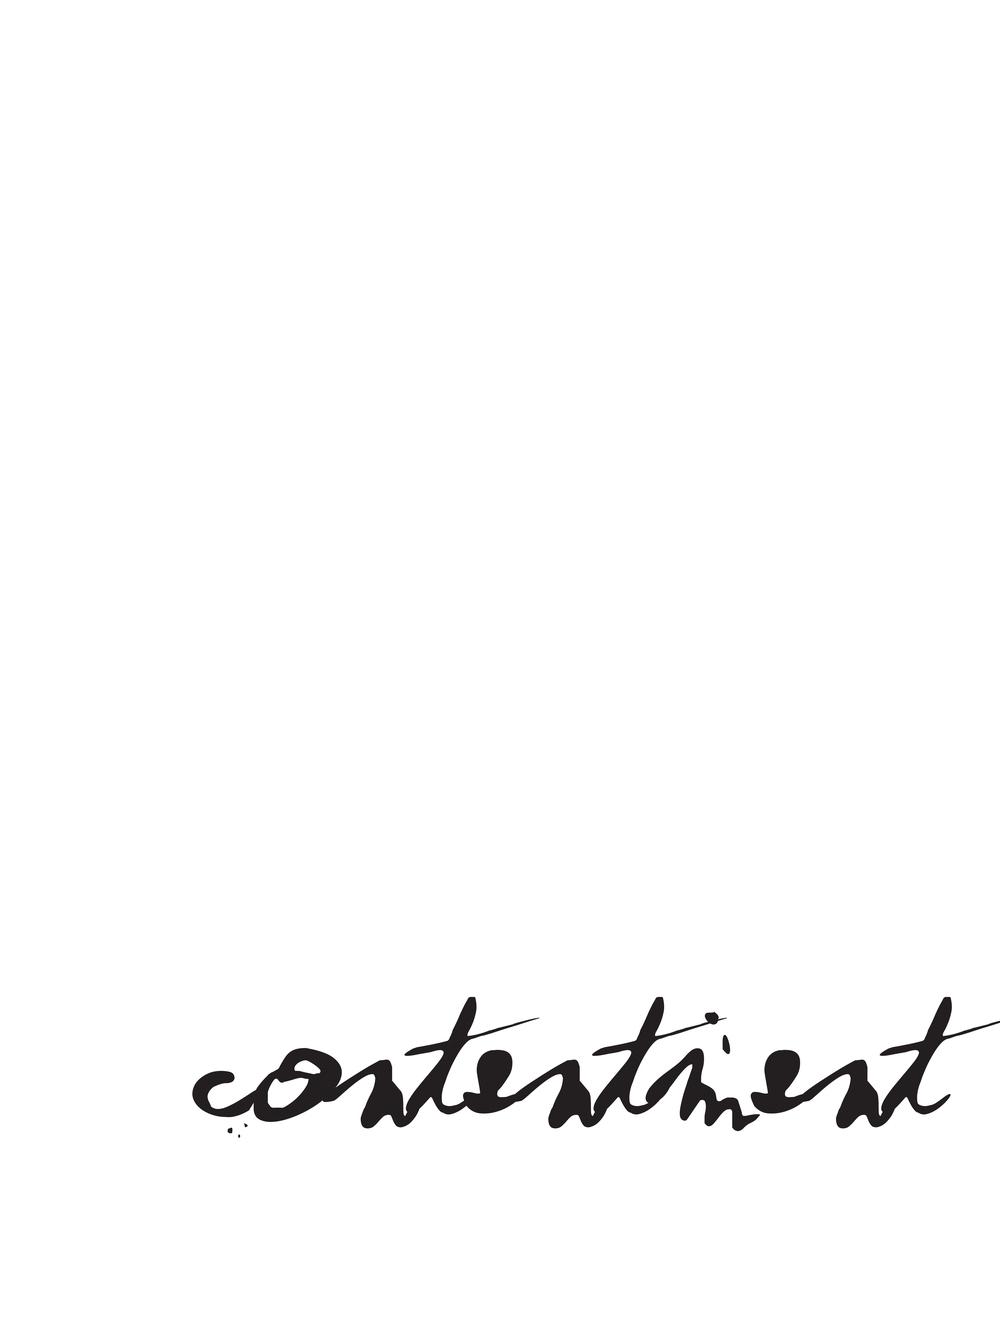 contentment_16x20.jpg